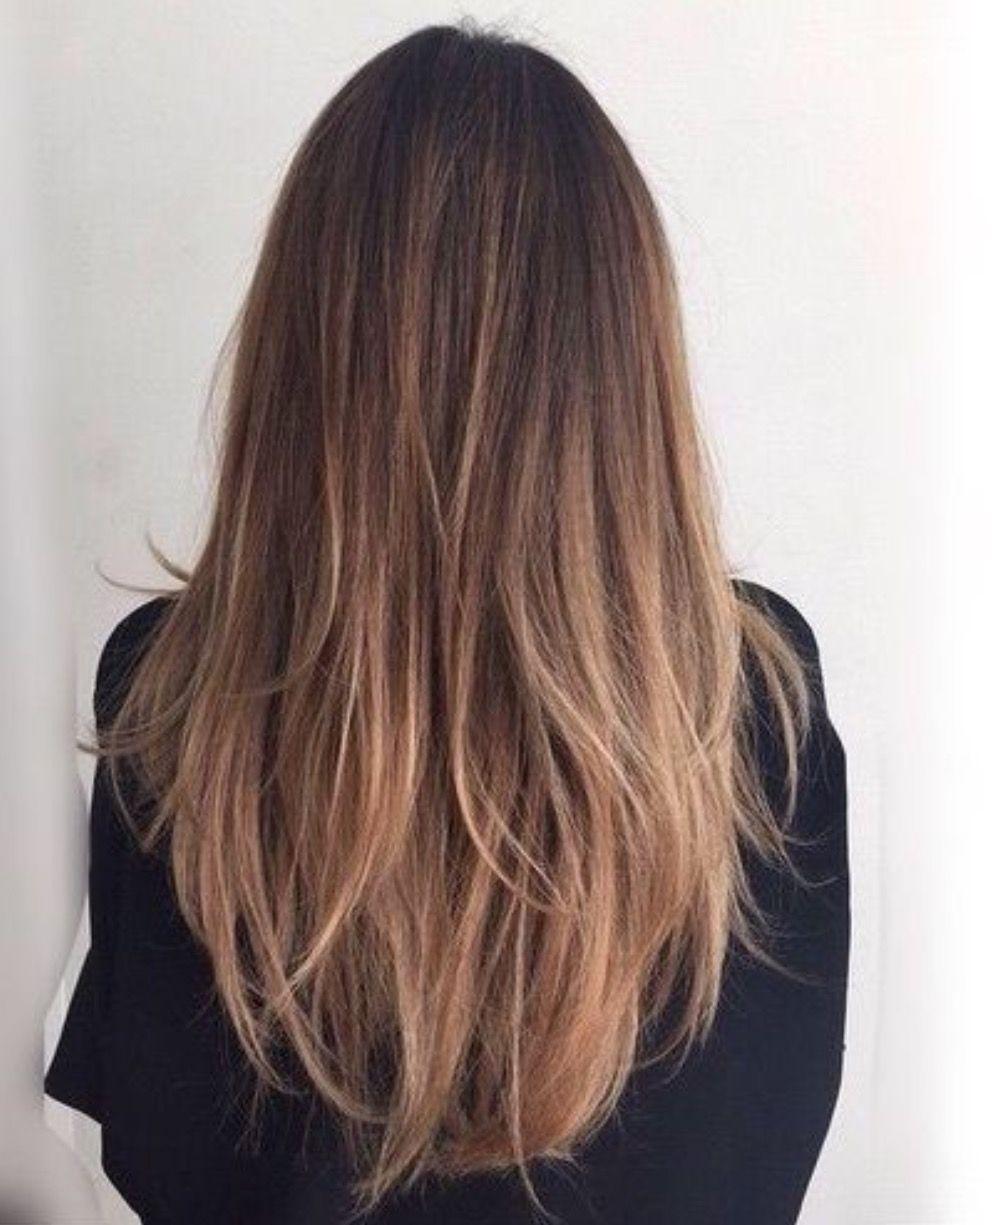 Long Natural Wavy Hair Balayage Longhairstyleswithlayers Brown Straight Hair Straight Hair Highlights Balayage Straight Hair